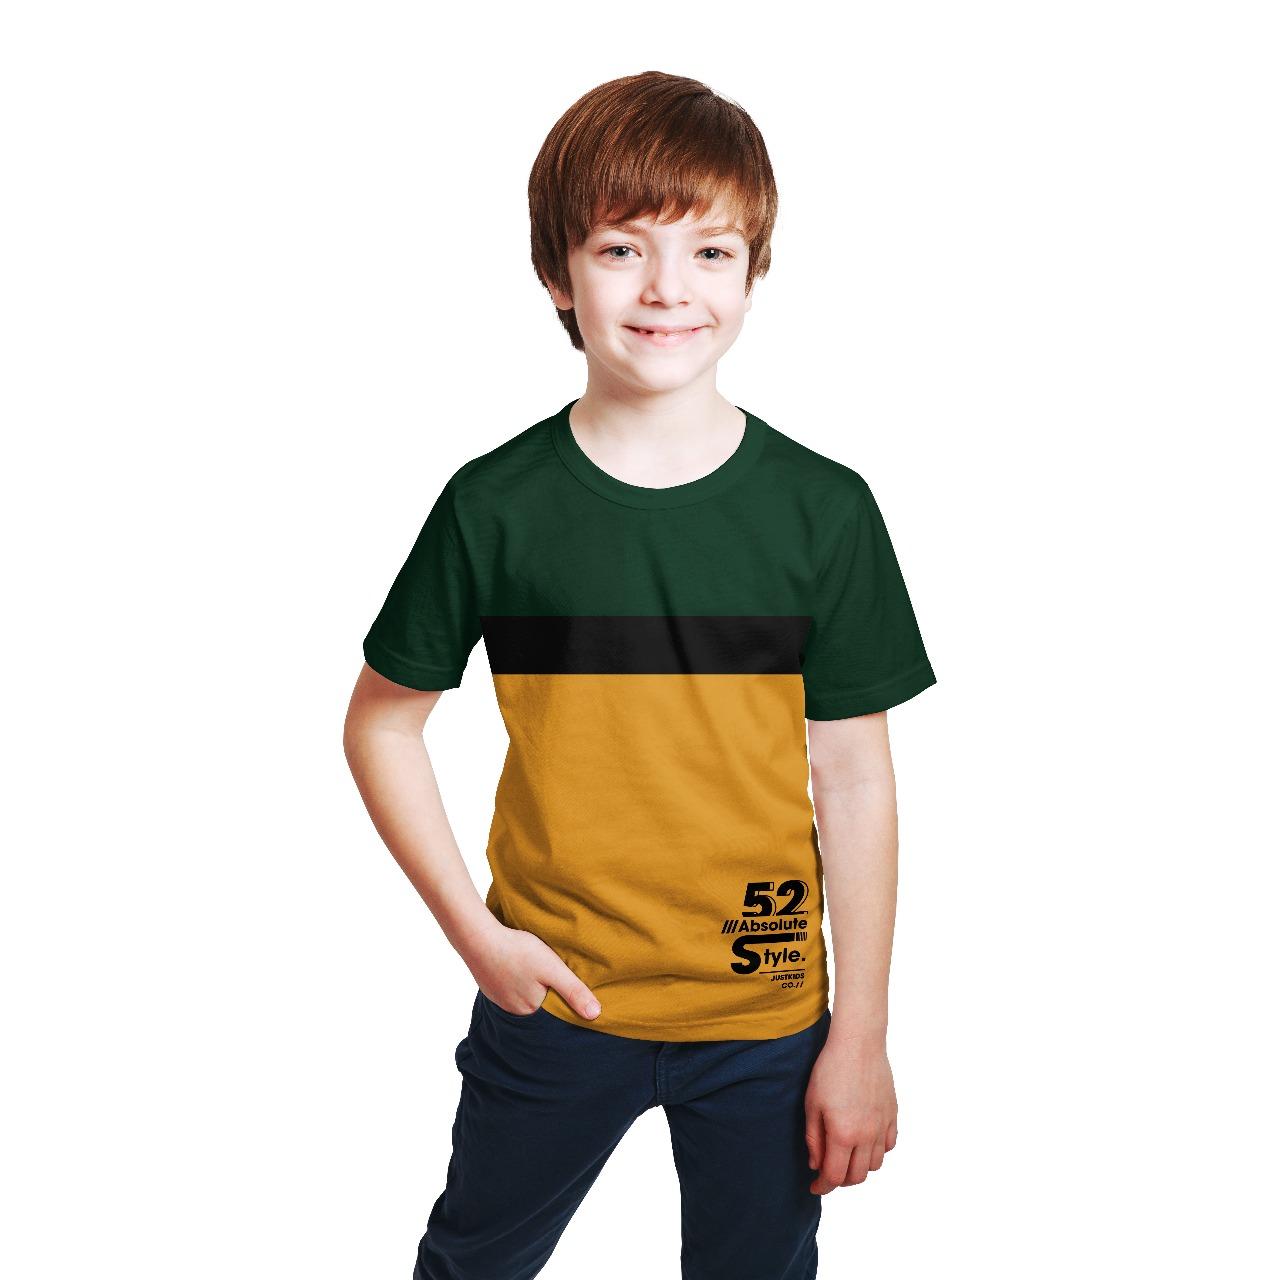 Just Kids Obl Fash Pendek 52 ABSOULT STYLE (ANKL00107)